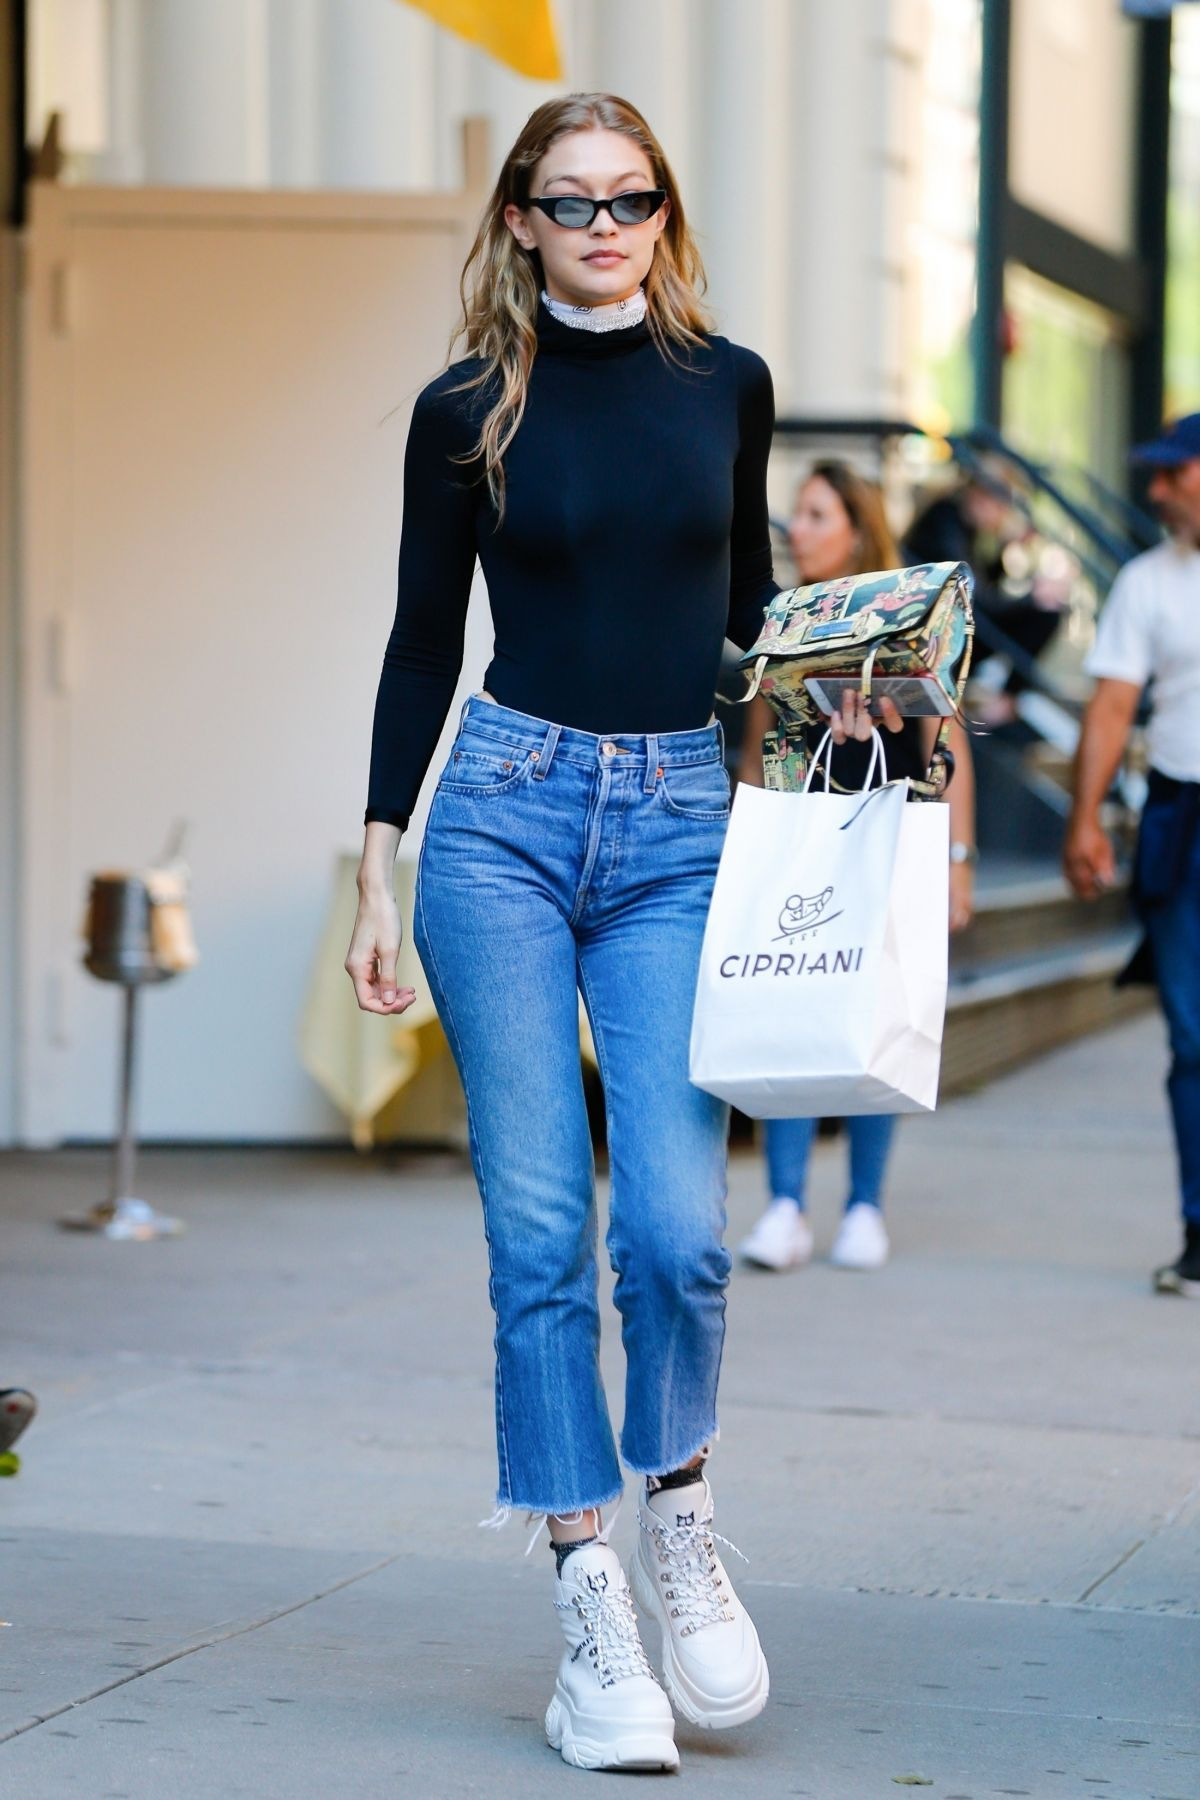 Gigi Hadid Out in New York 06042018. #celebrity #fashion